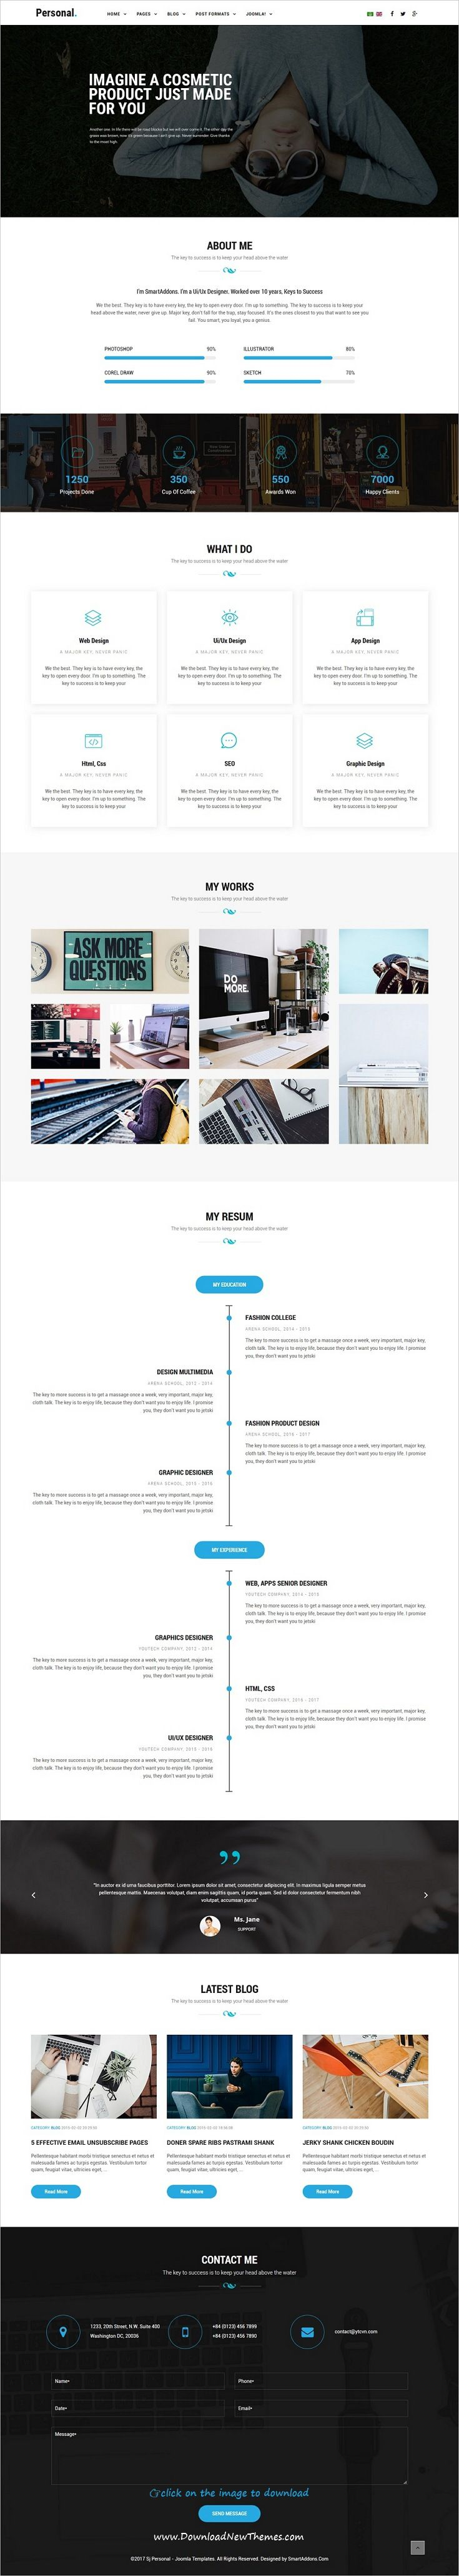 43 best Shared joomla templates images on Pinterest | Joomla ...